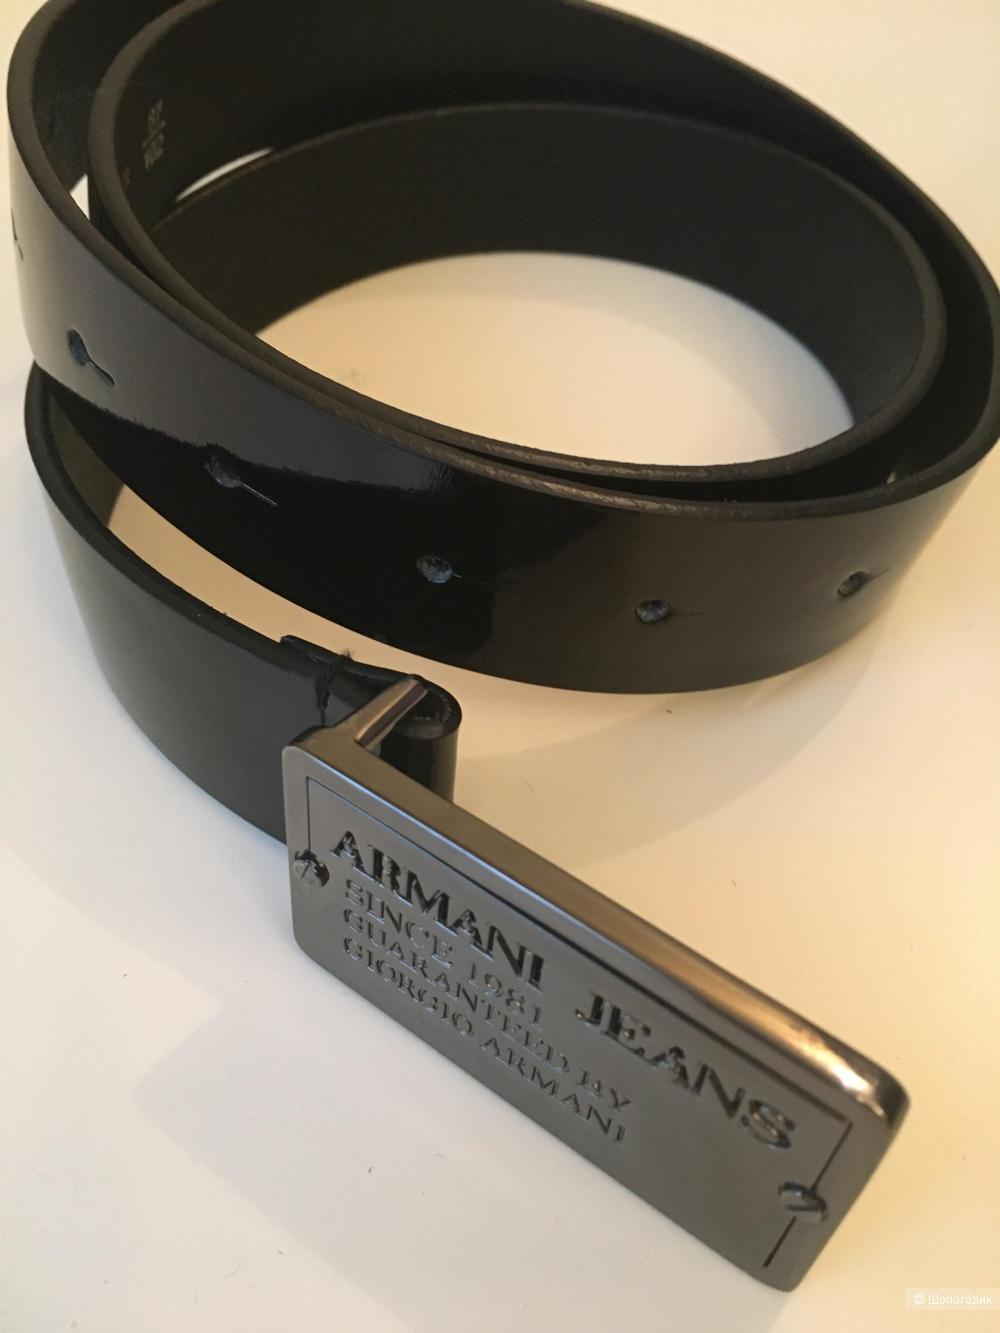 Ремень Armani Jeans, размер размер 87-102